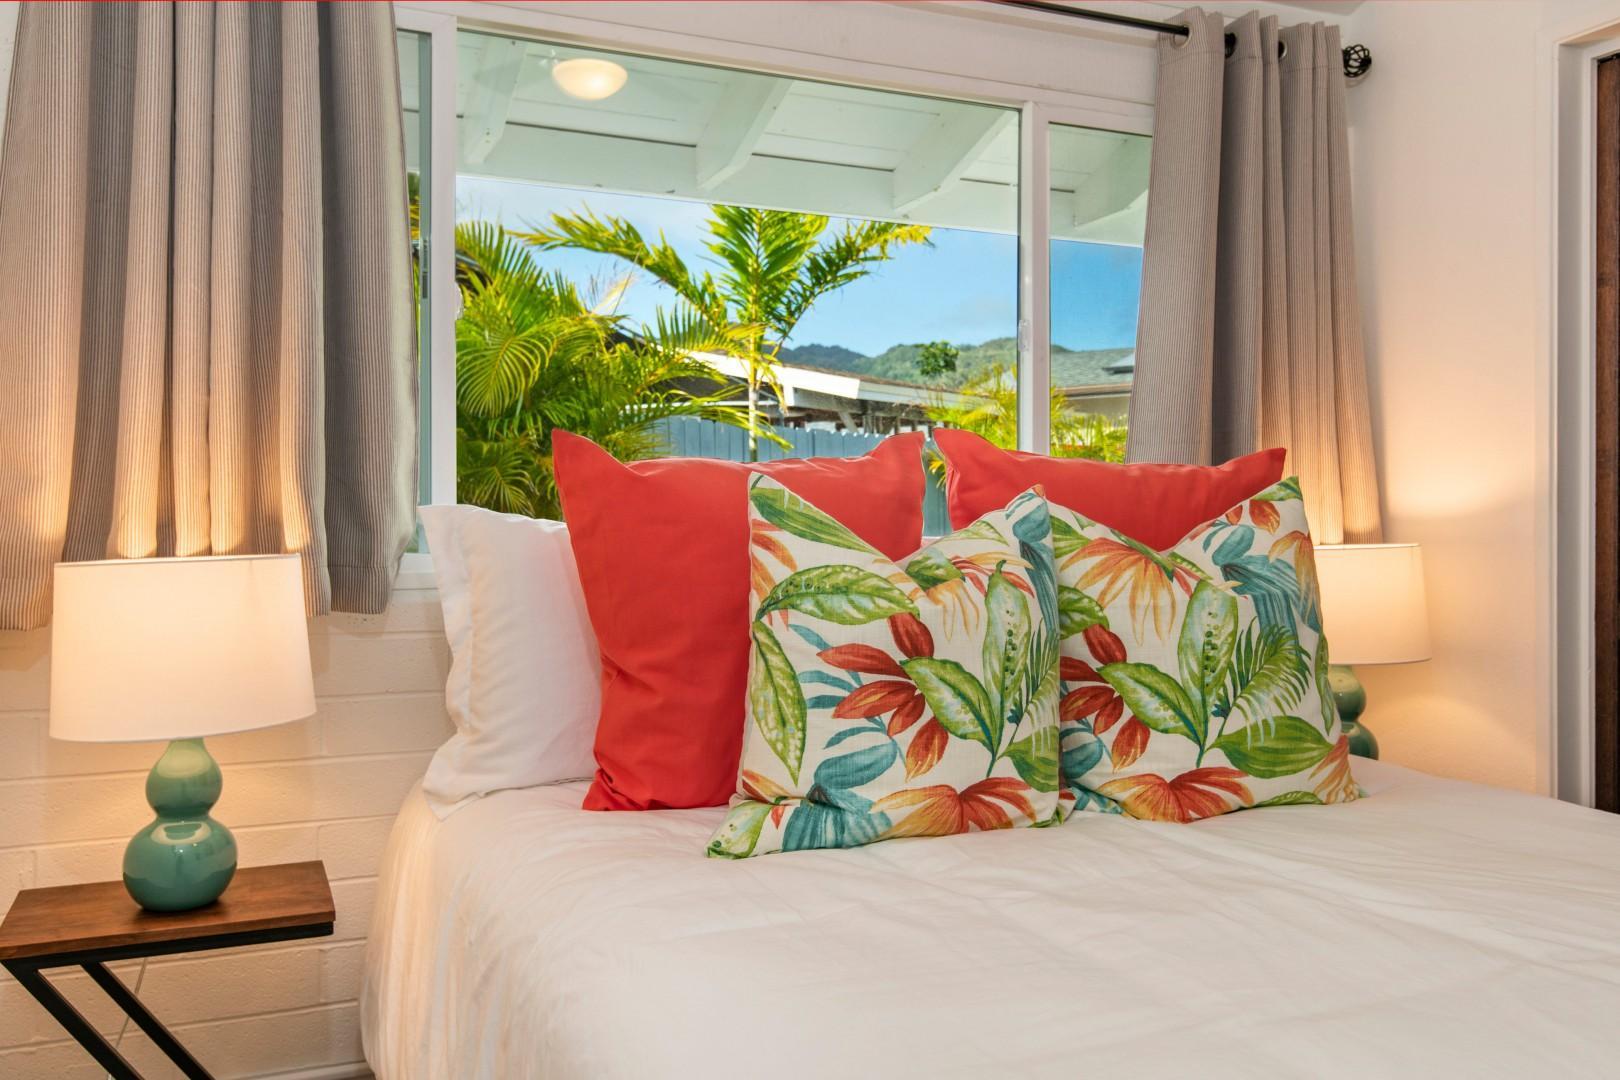 Bedroom 2 - Queen bed, split ac with back yard garden and jacuzzi views.